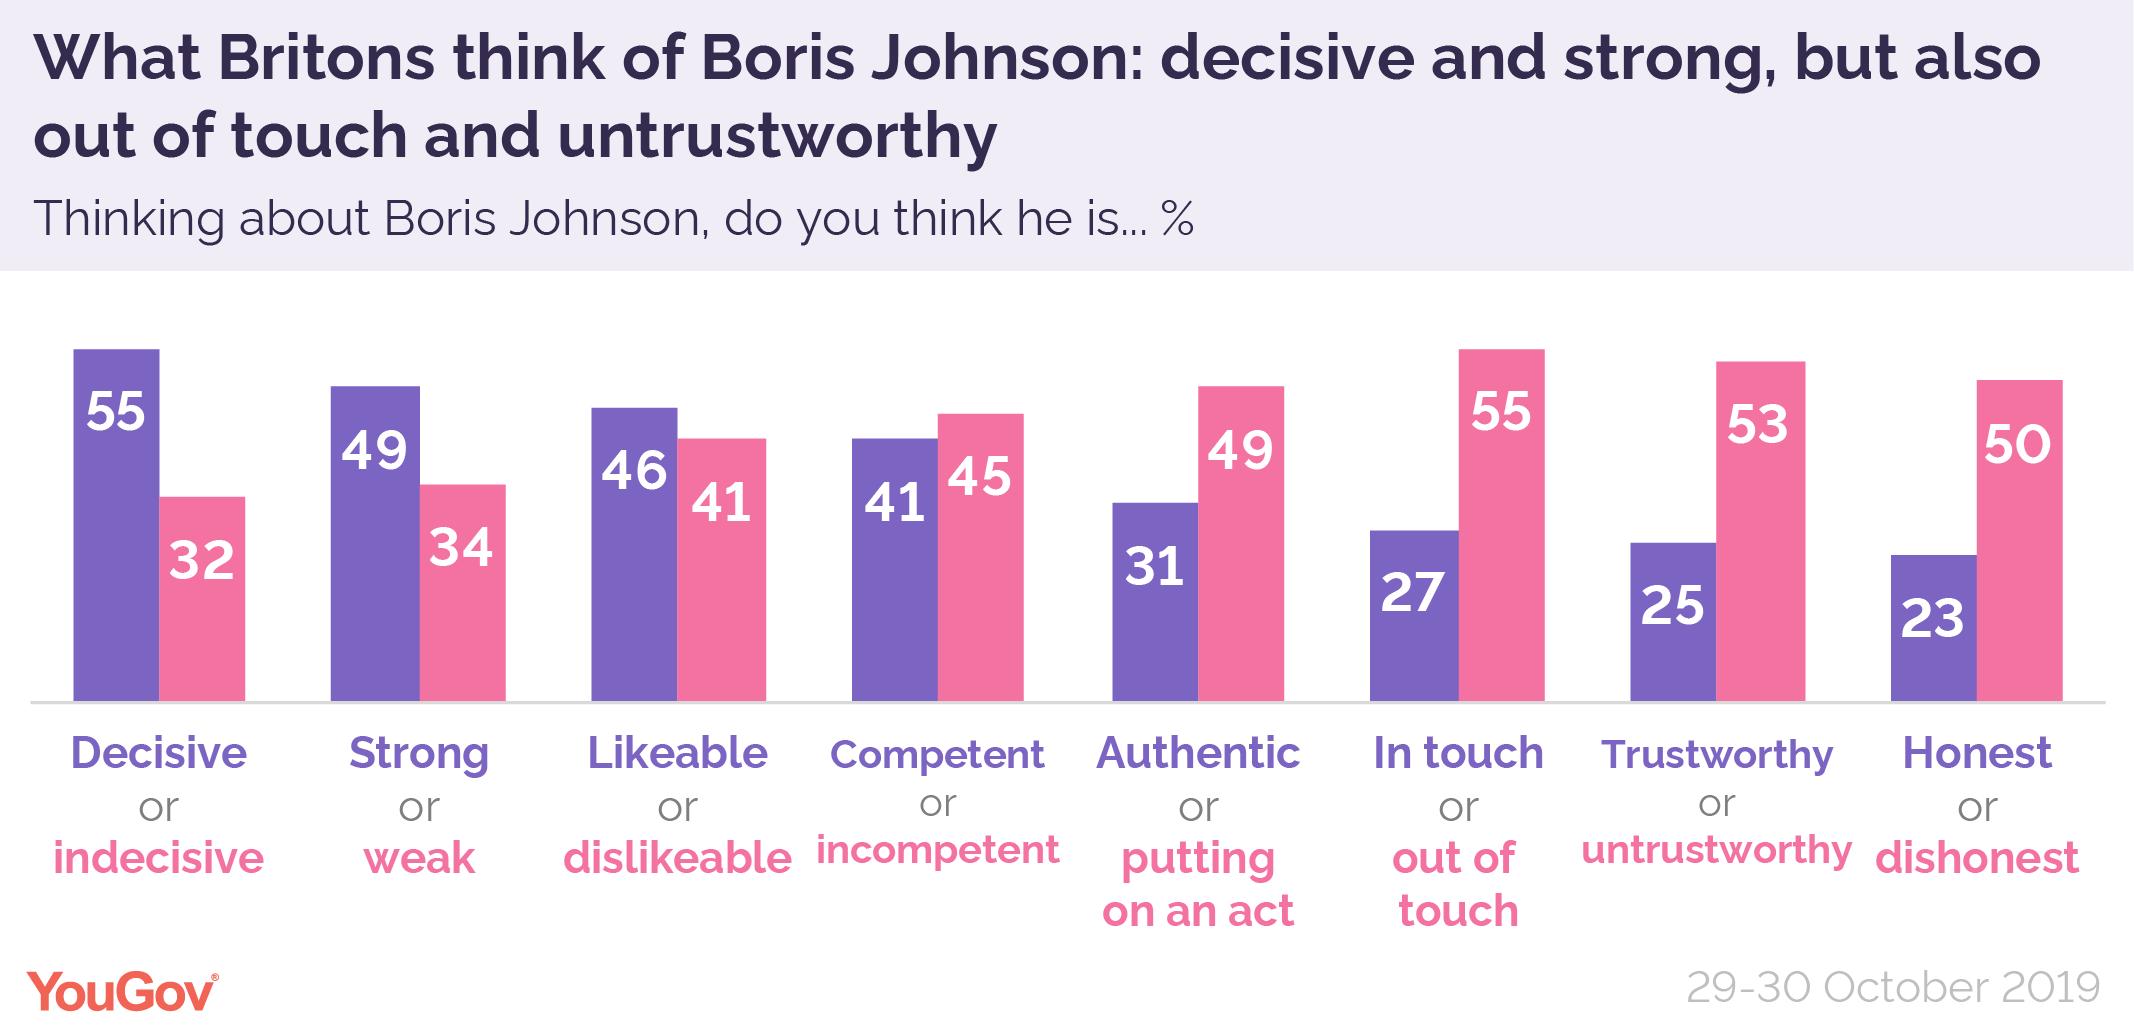 Boris%20Johnson%20attributes%20Oct%202019-01.png